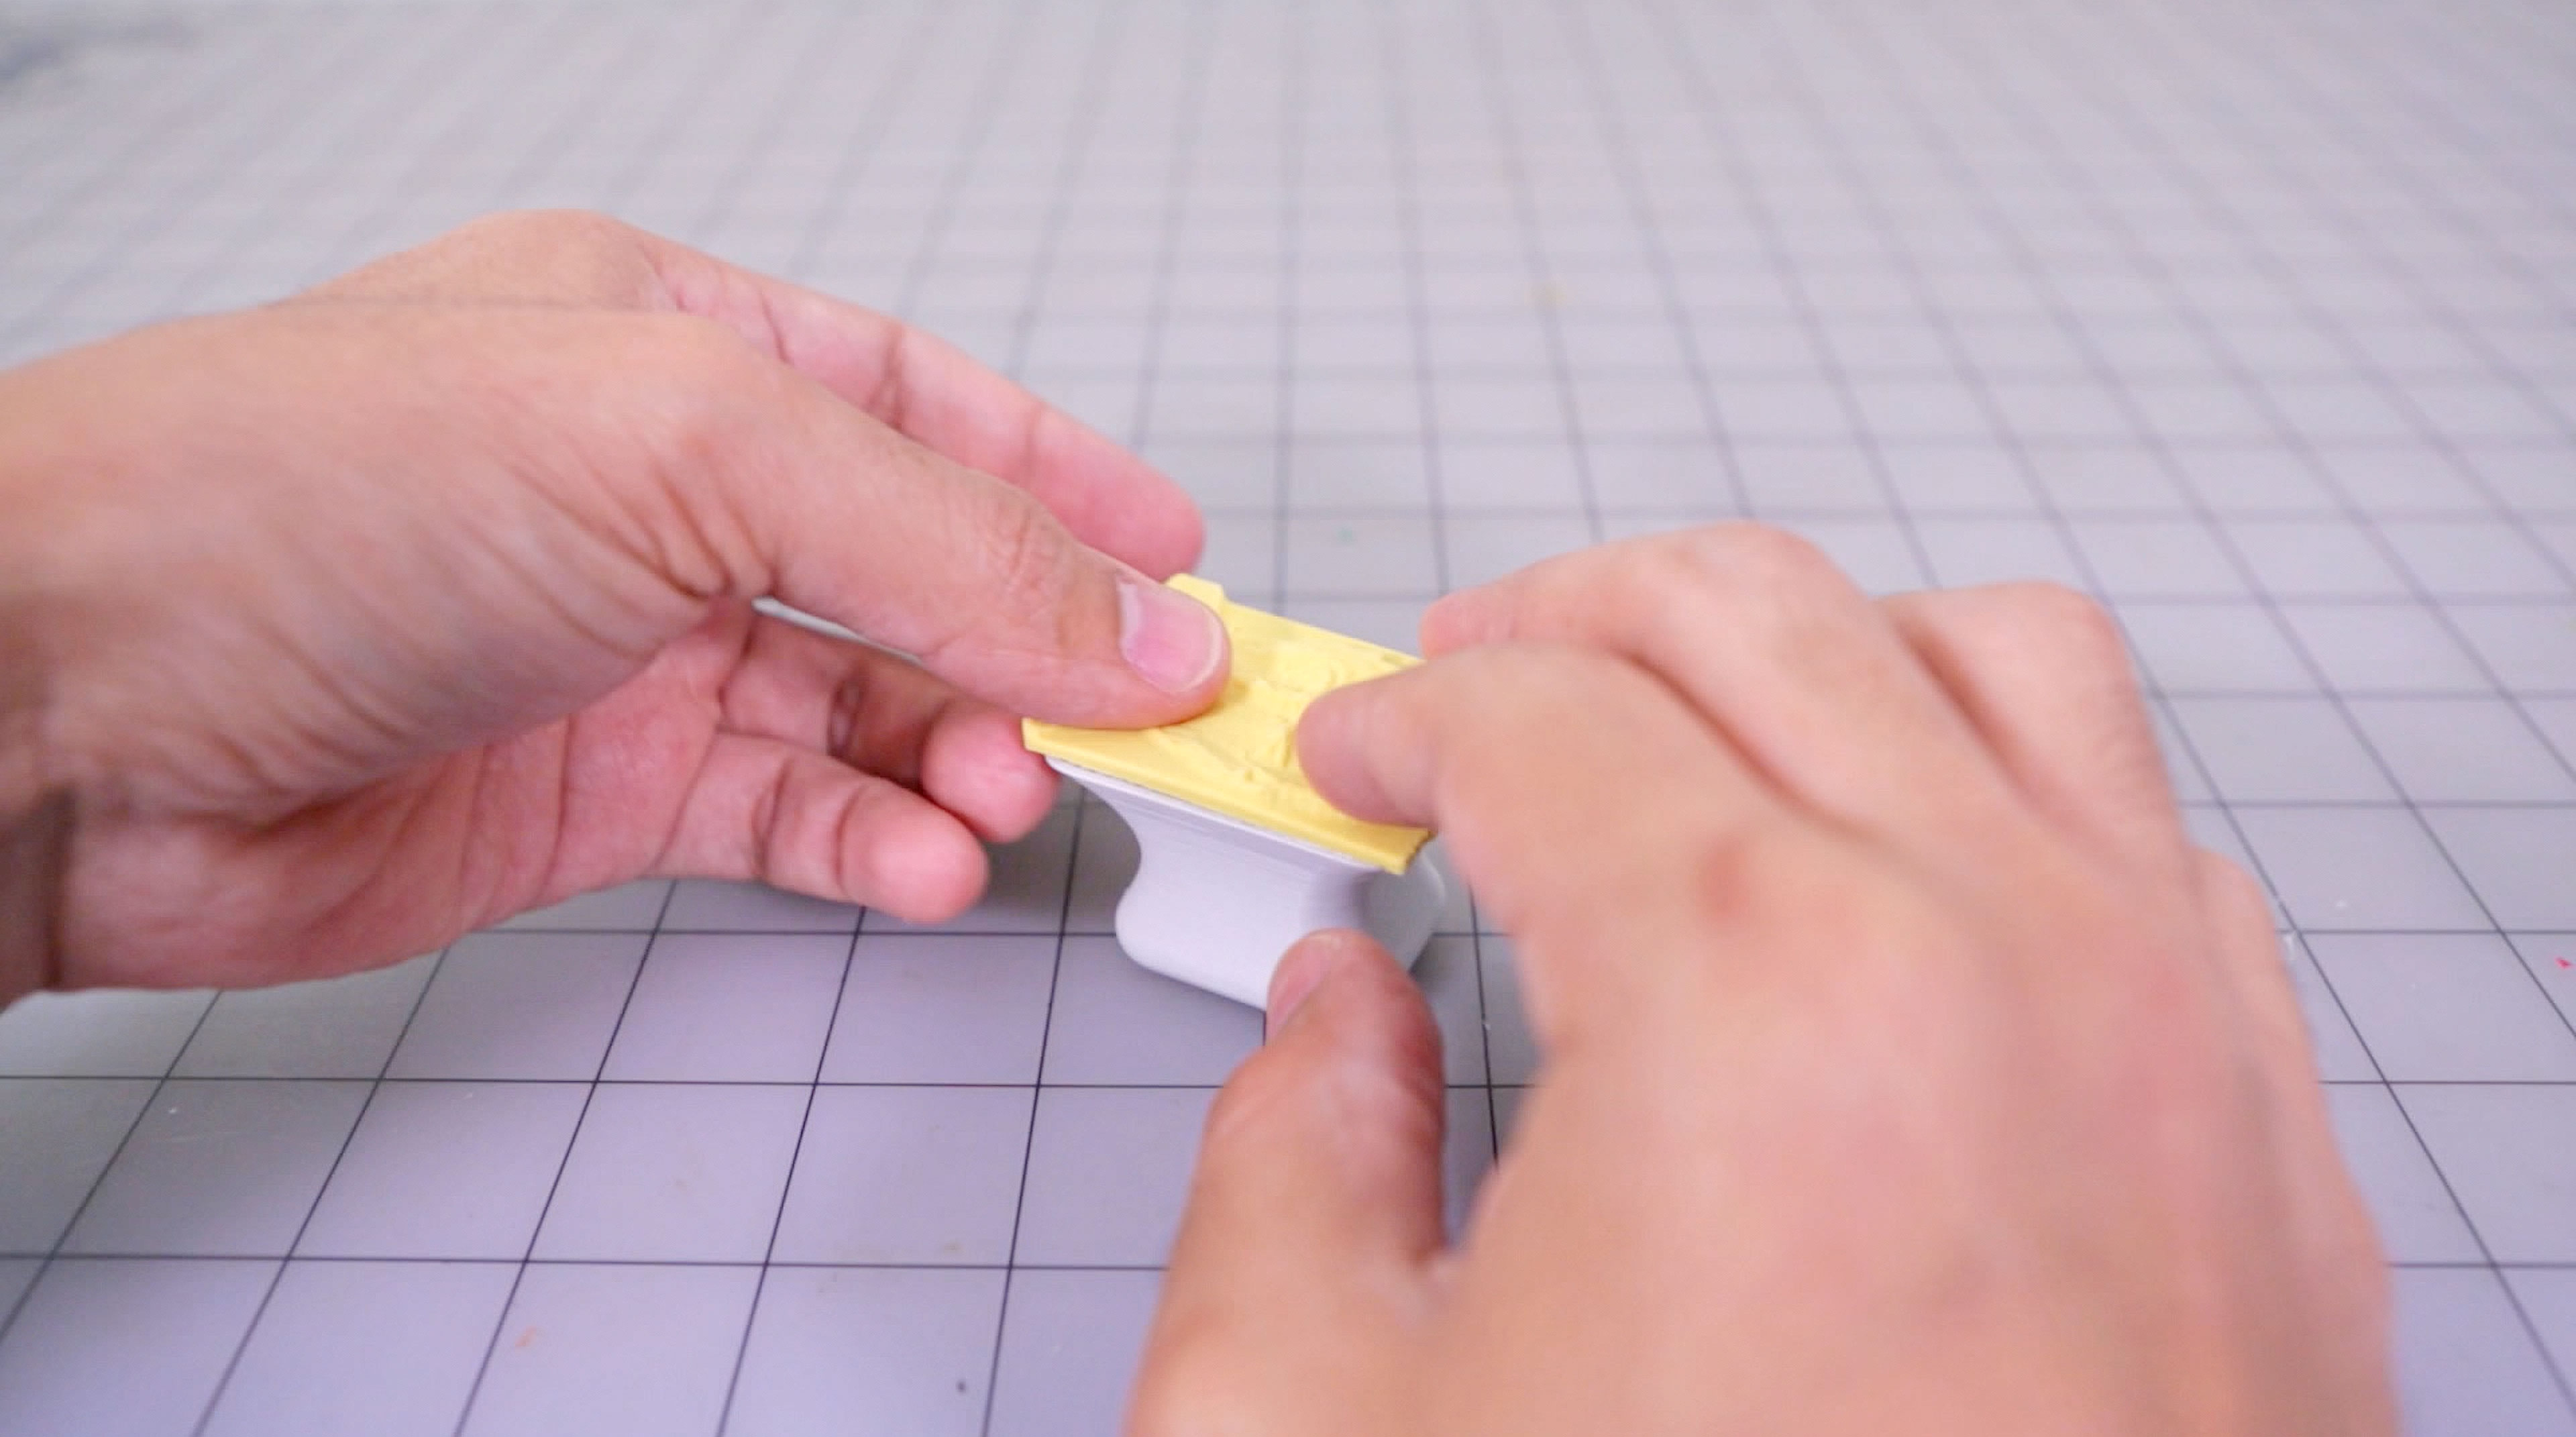 3d_printing_handle-glue-press.jpg